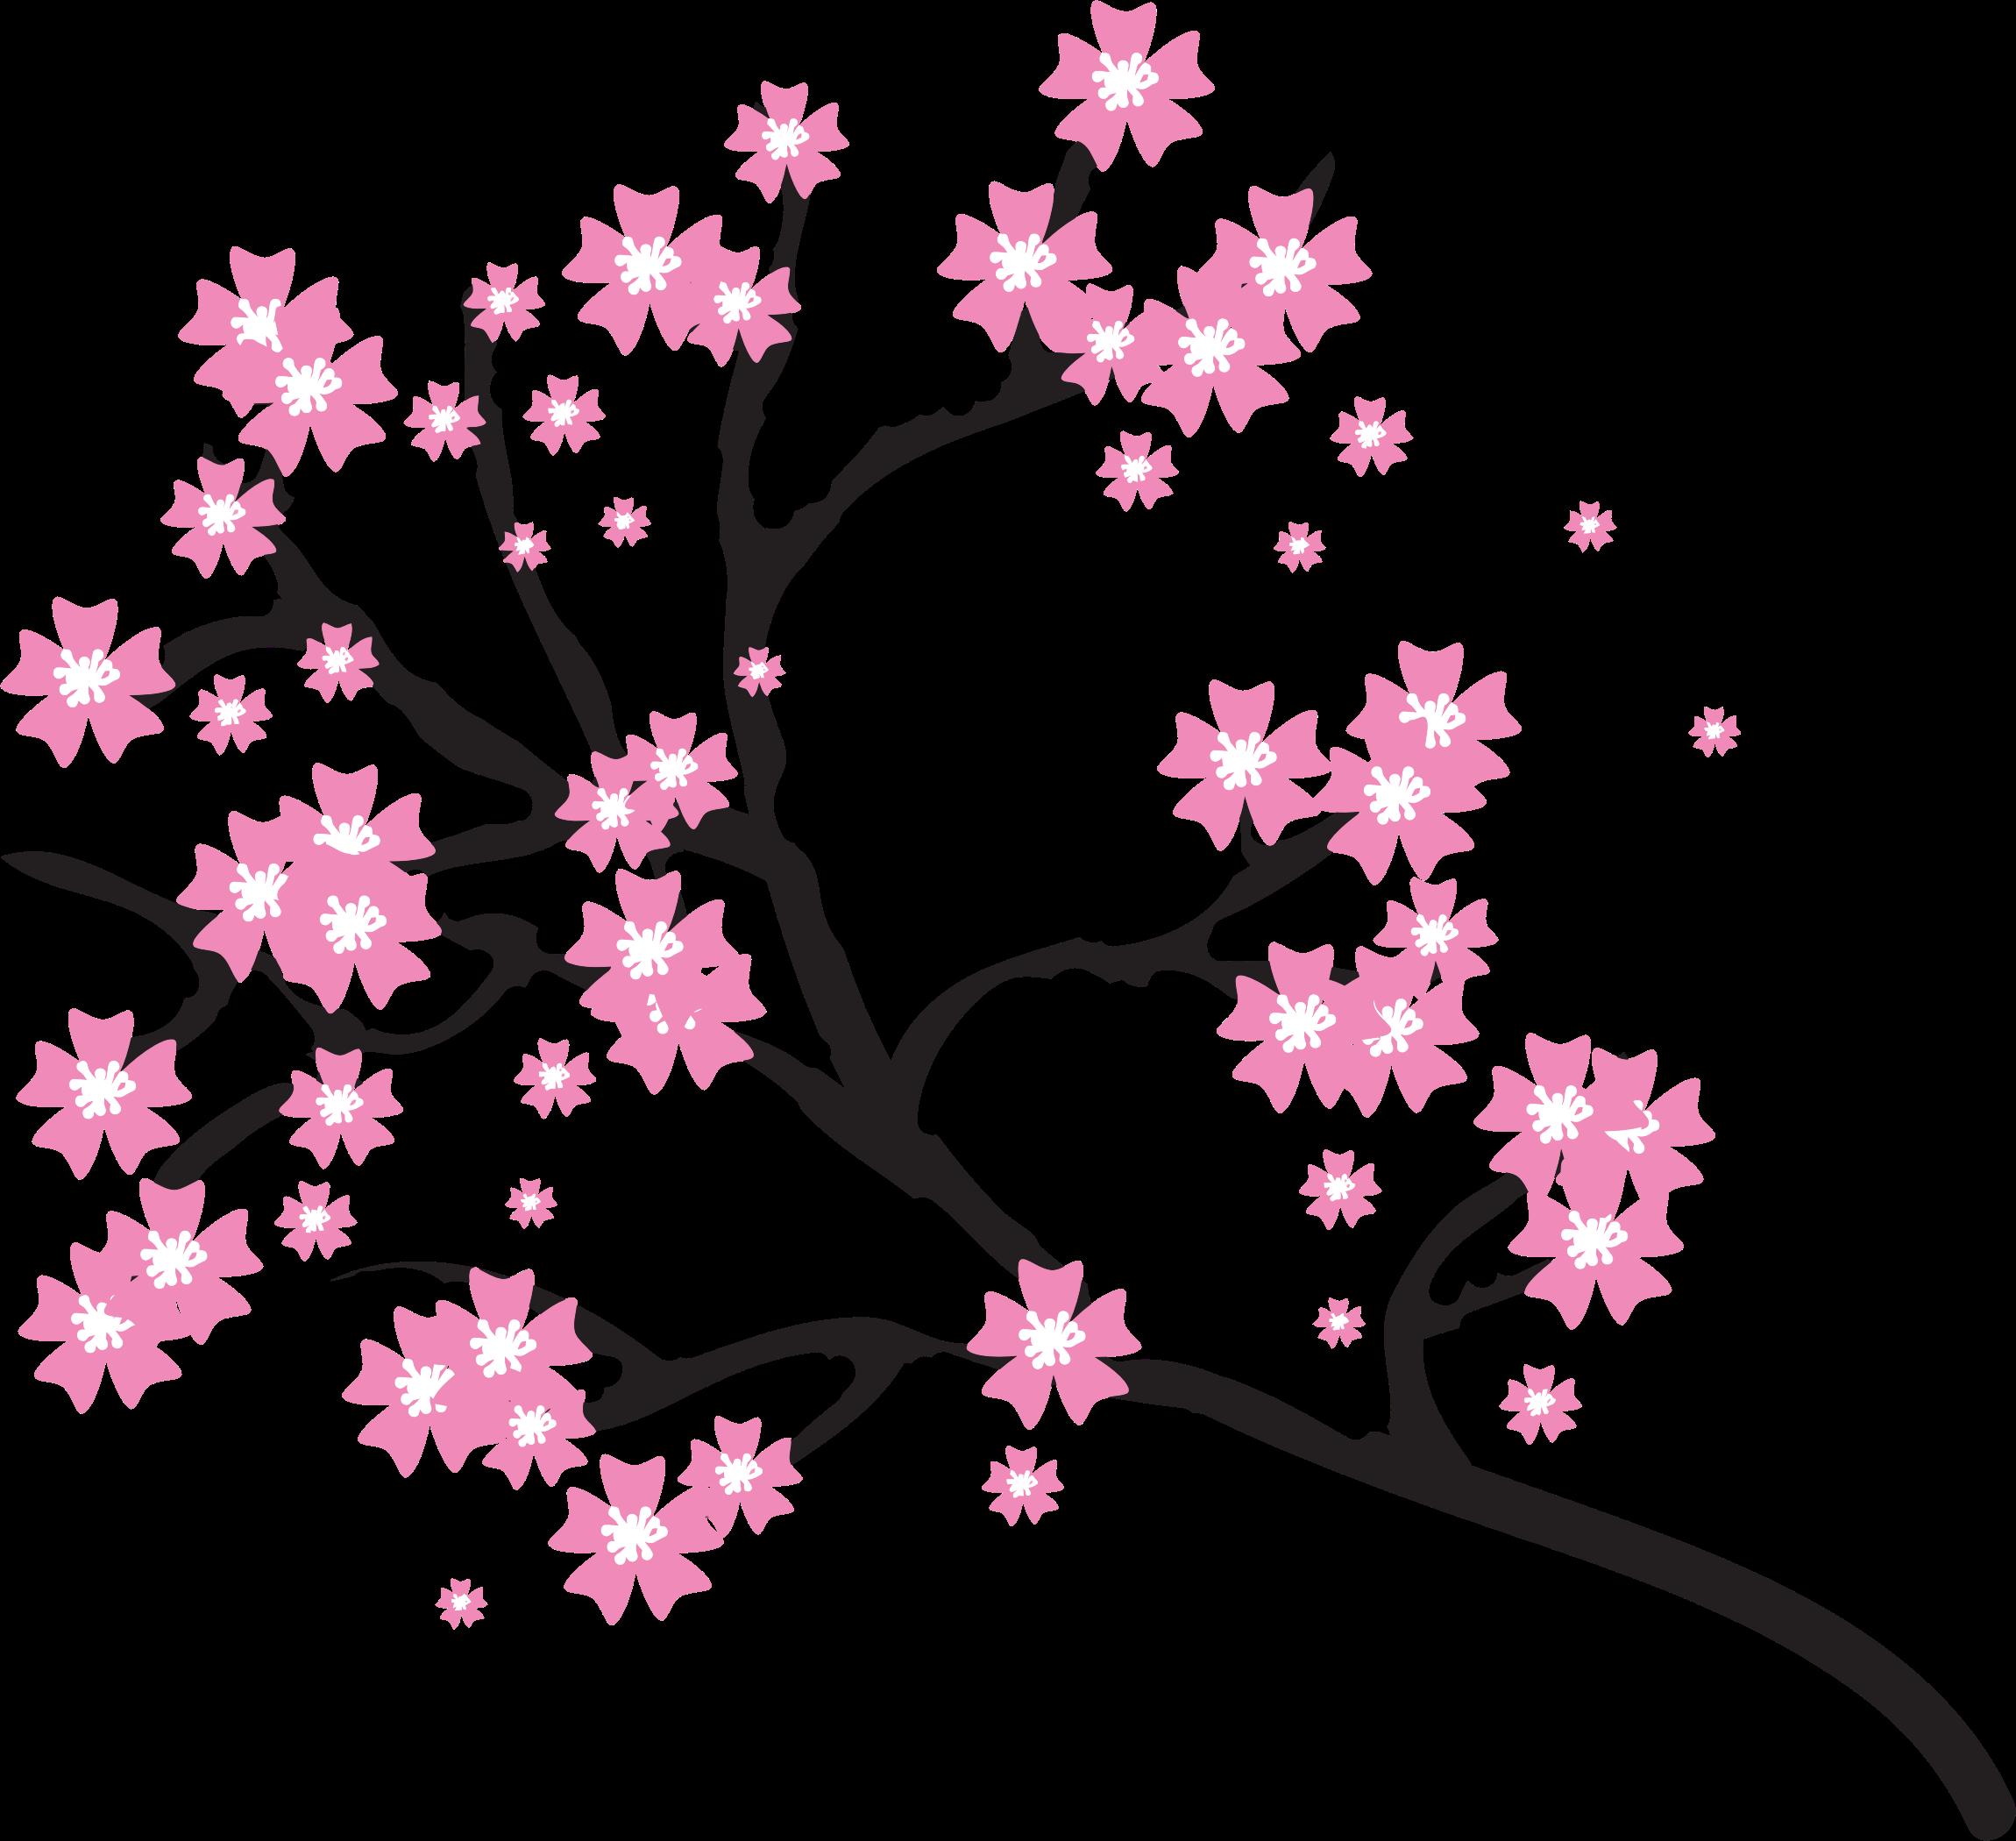 50+ Cherry Blossom Transparent Background Flower Png - さととめ